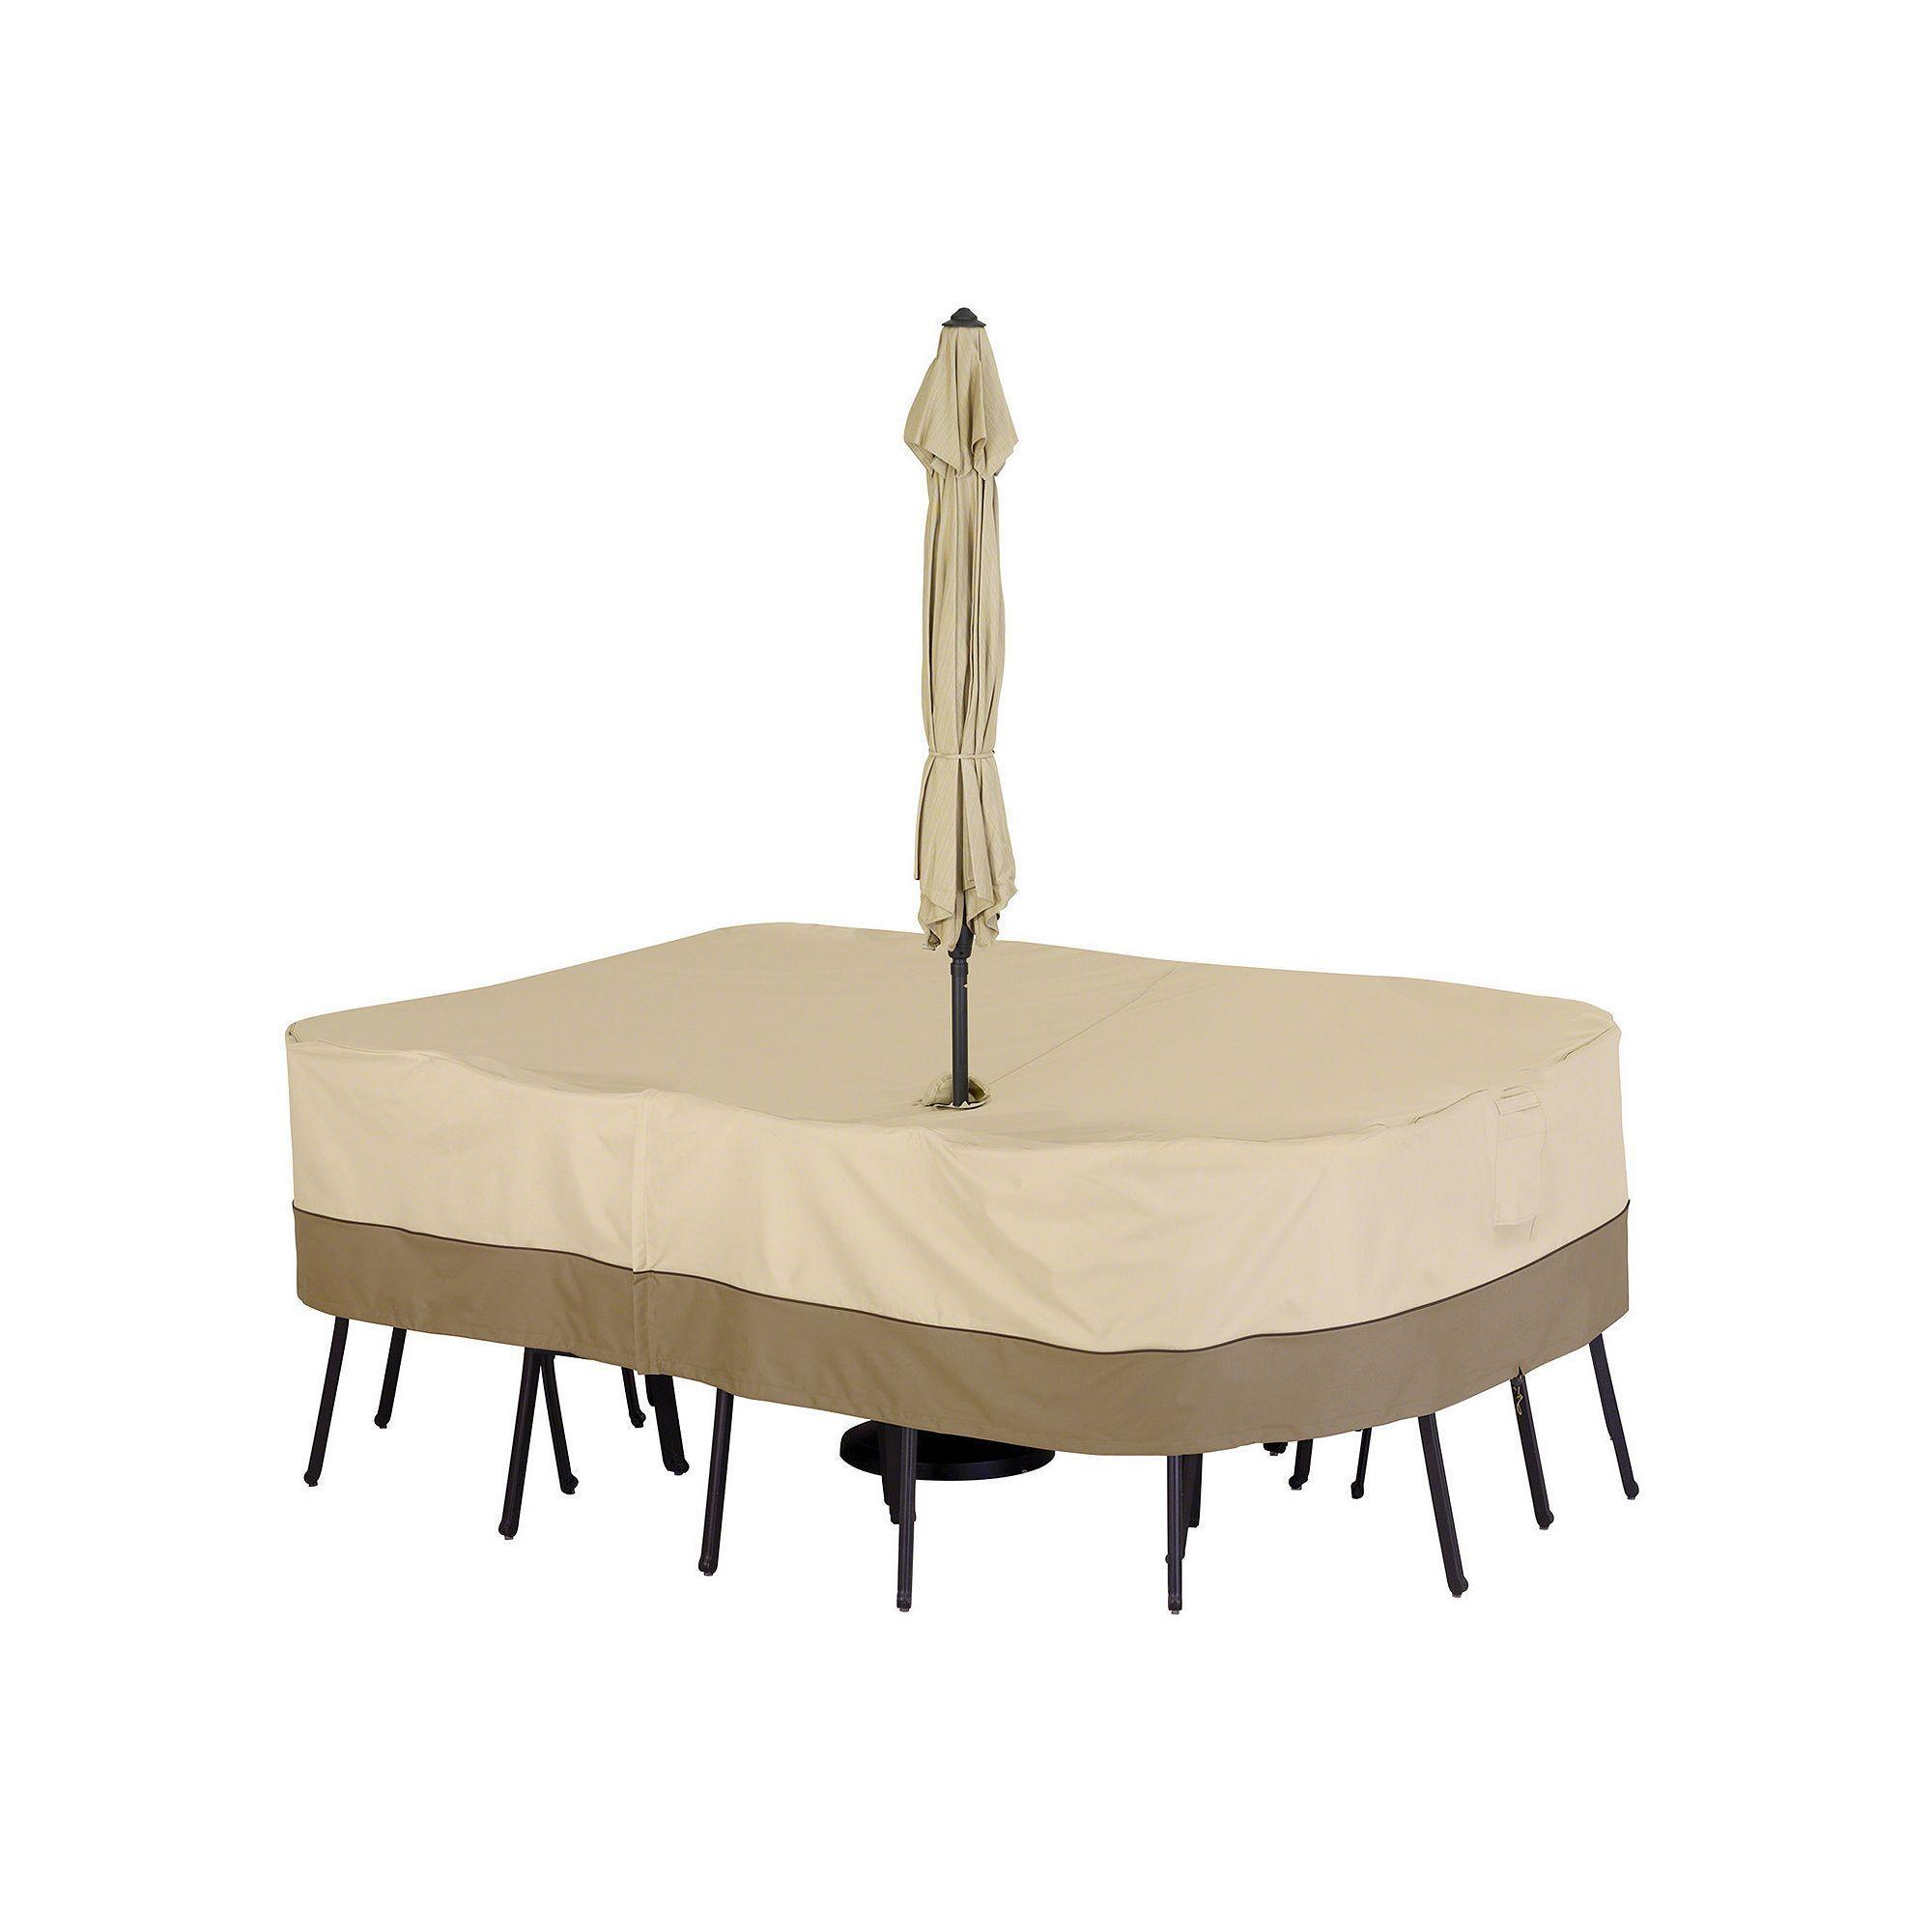 Outdoor Classic Accessories Veranda Large Rectangle Patio Table Cover U0026  Umbrella Hole, Beig/Green